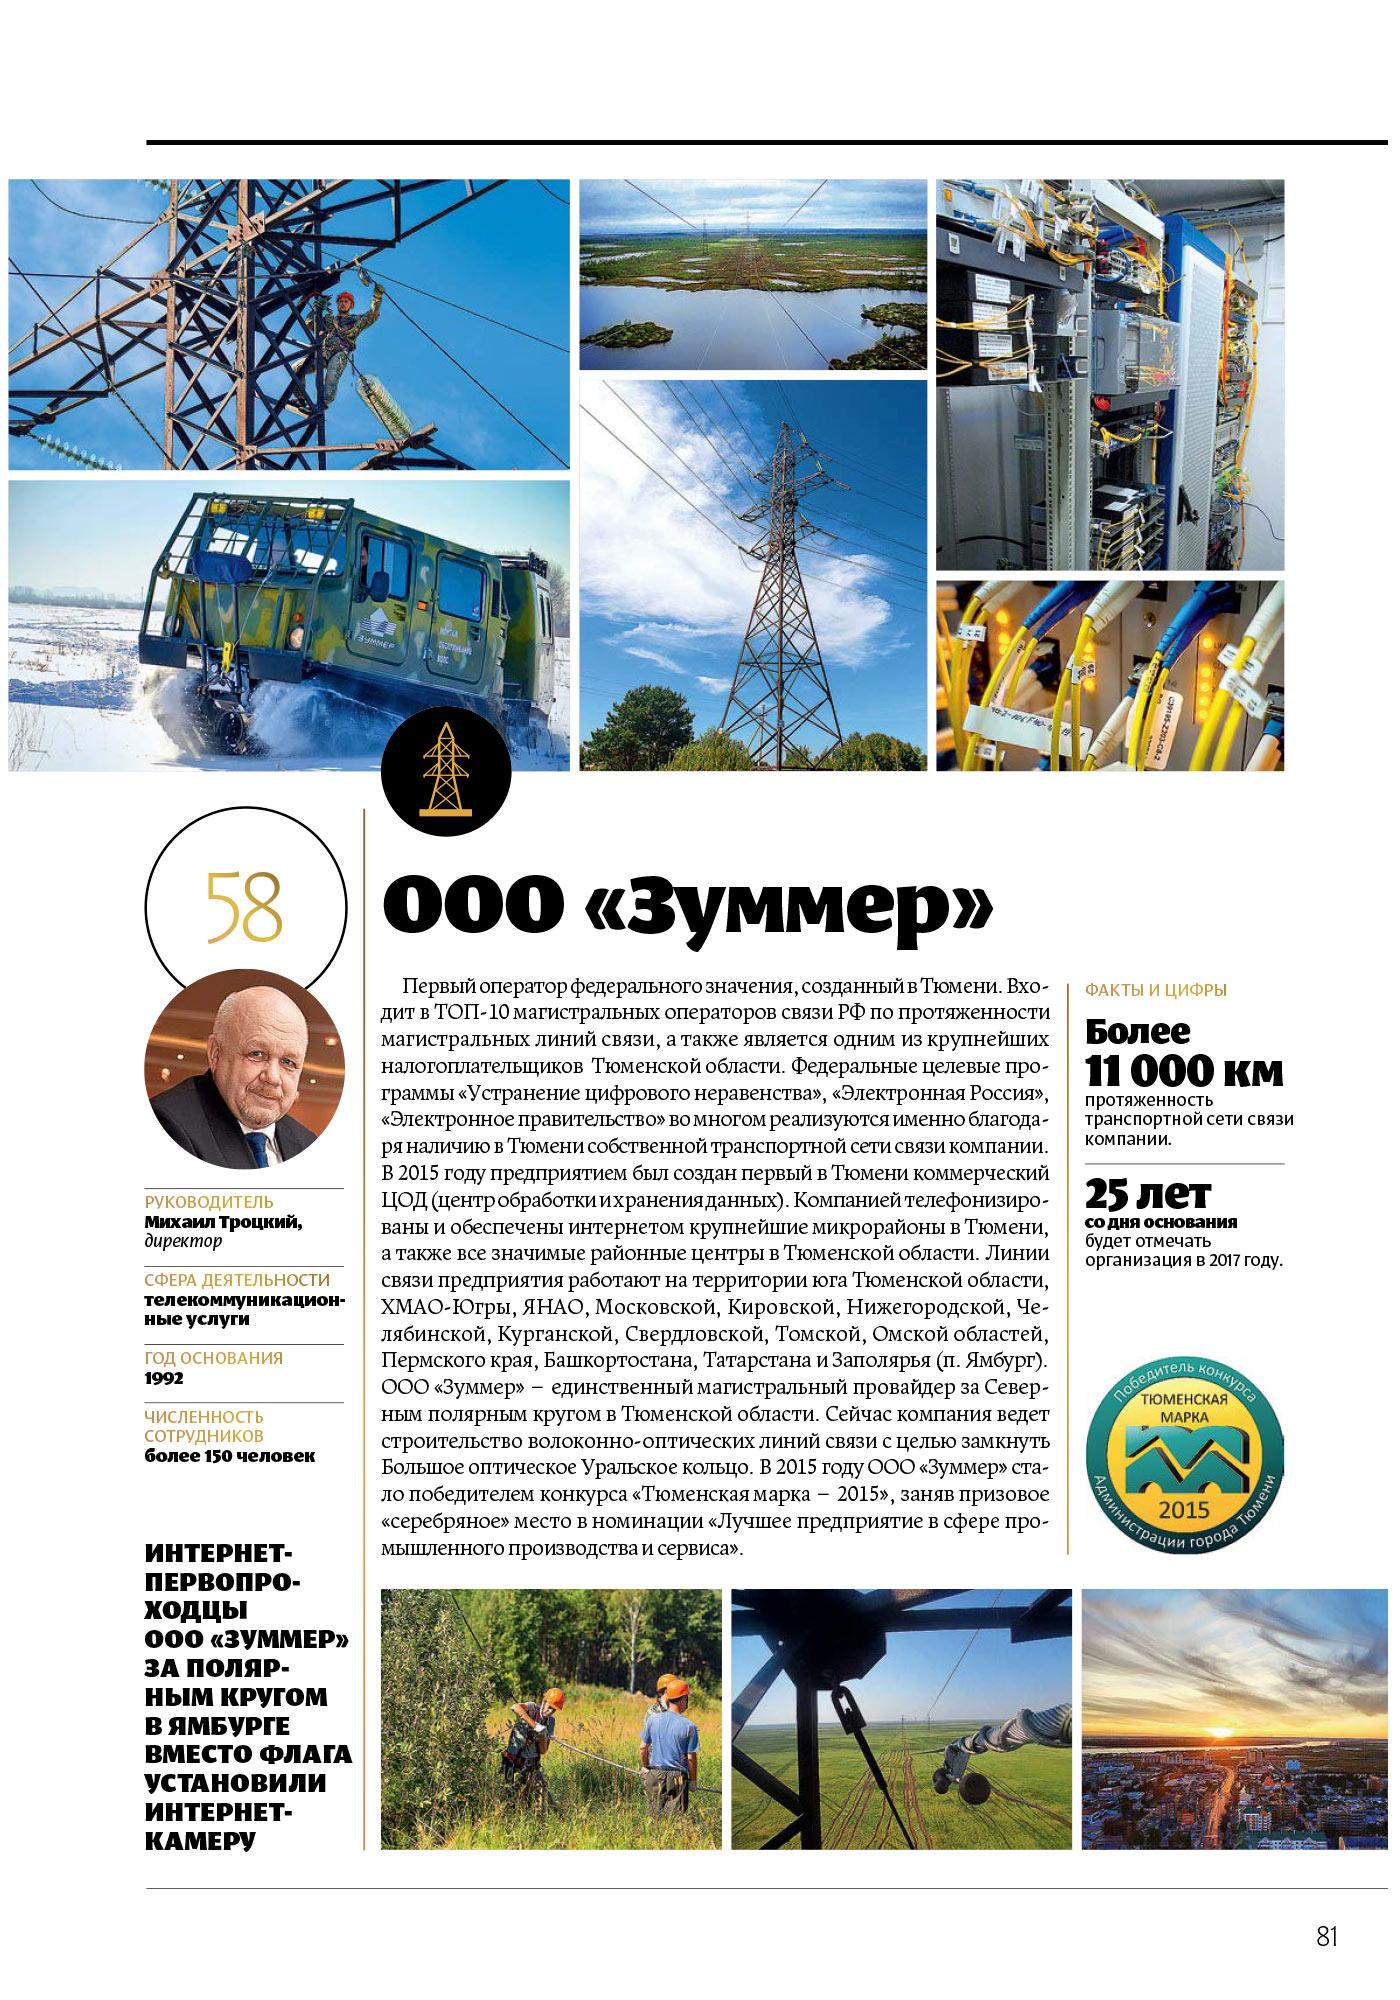 Журнал «Tmn». Топ-100 главных компаний Тюмени